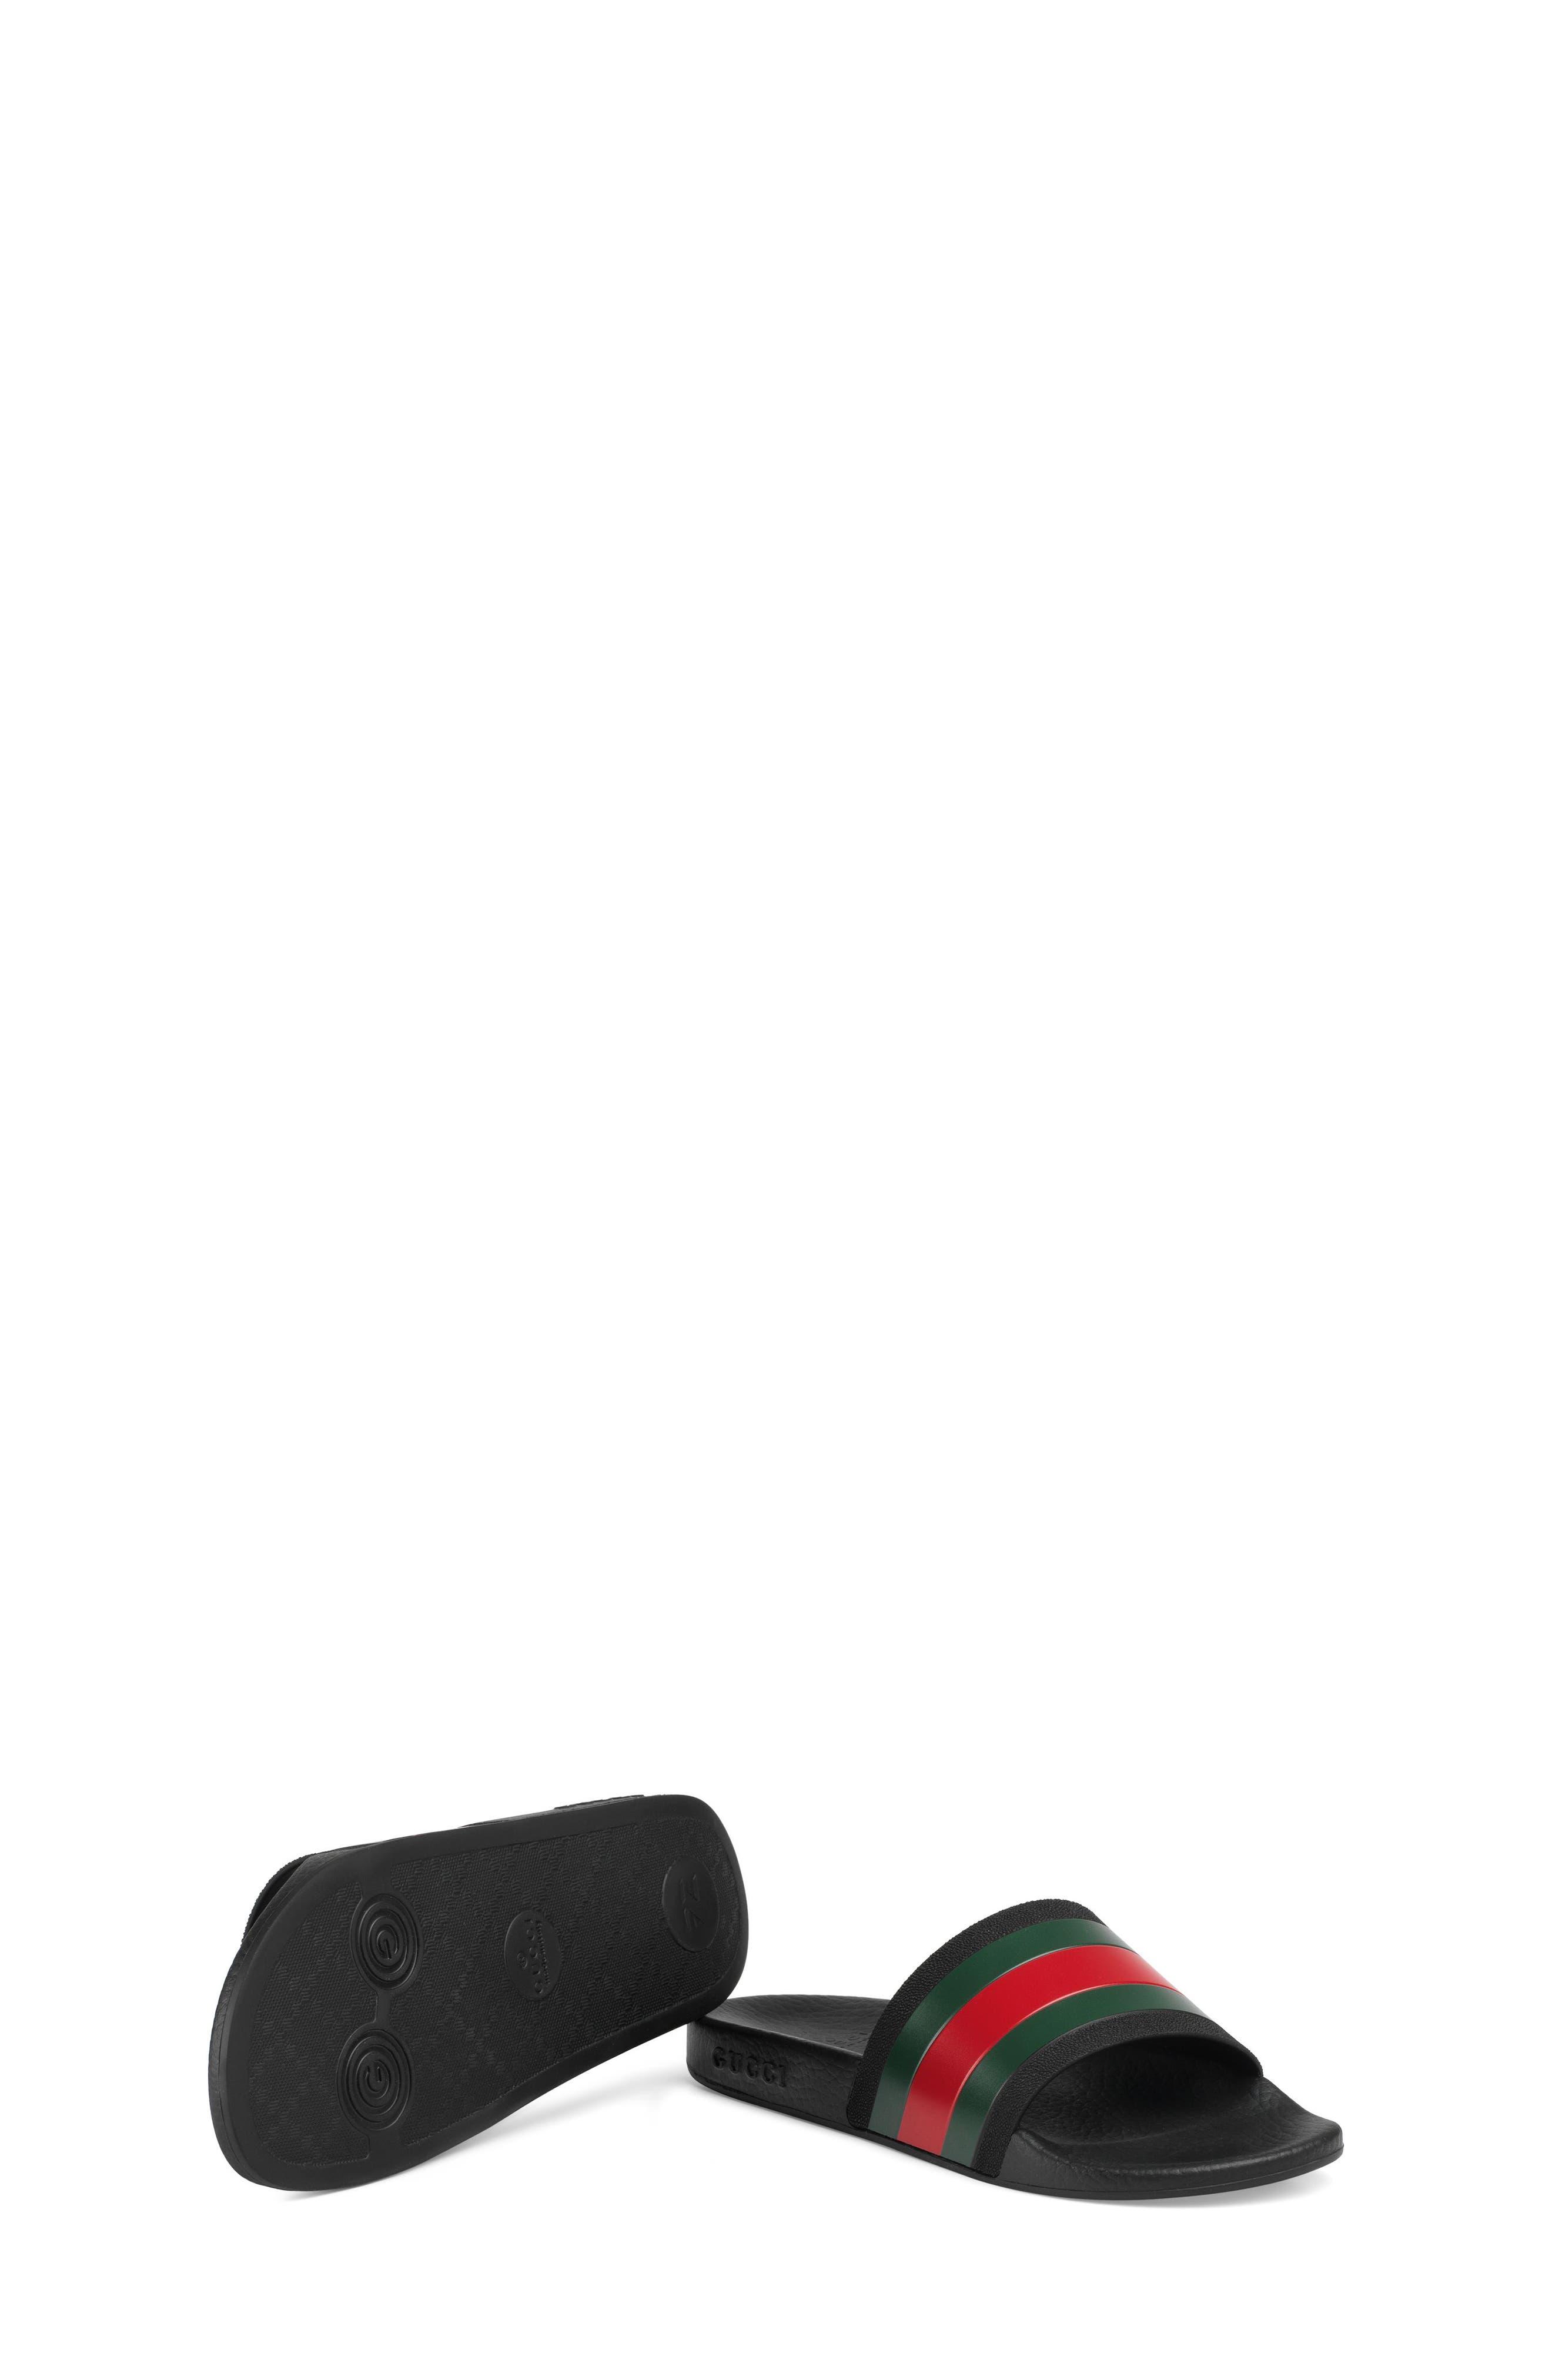 GUCCI, Pursuit Slide Sandal, Alternate thumbnail 6, color, BLACK/ GREEN/ RED